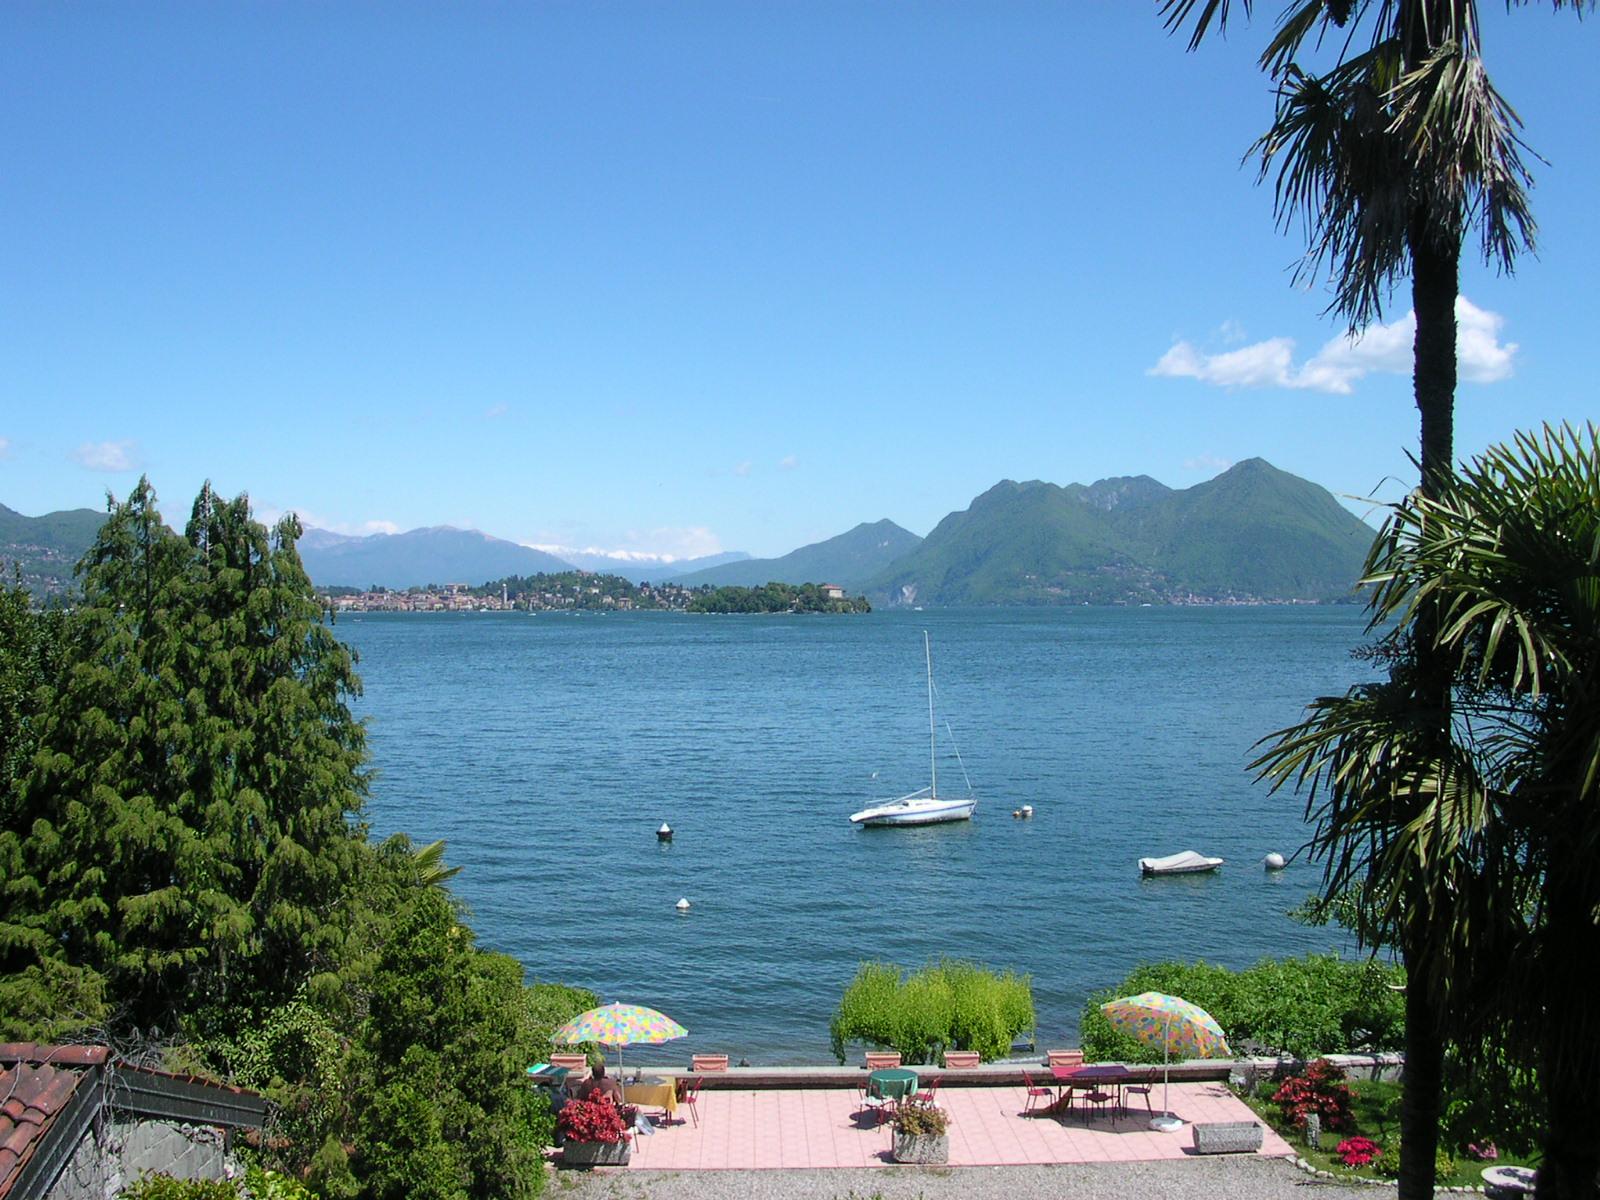 Baveno aan het Lago Maggiore